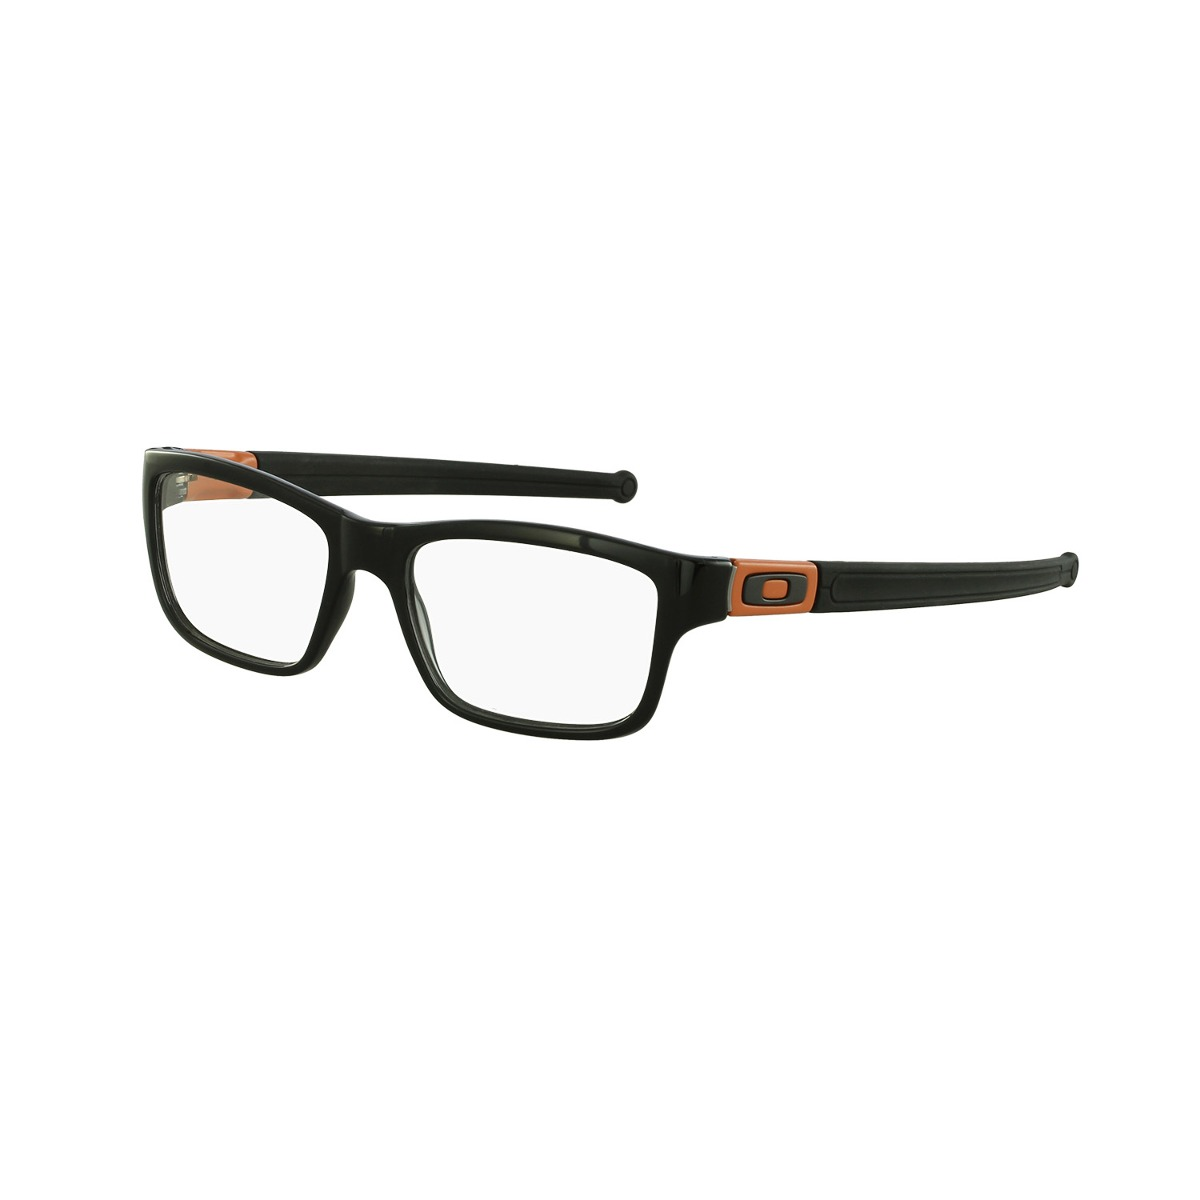 1697d80c815e6 óculos grau masculino oakley casual preto. Carregando zoom.